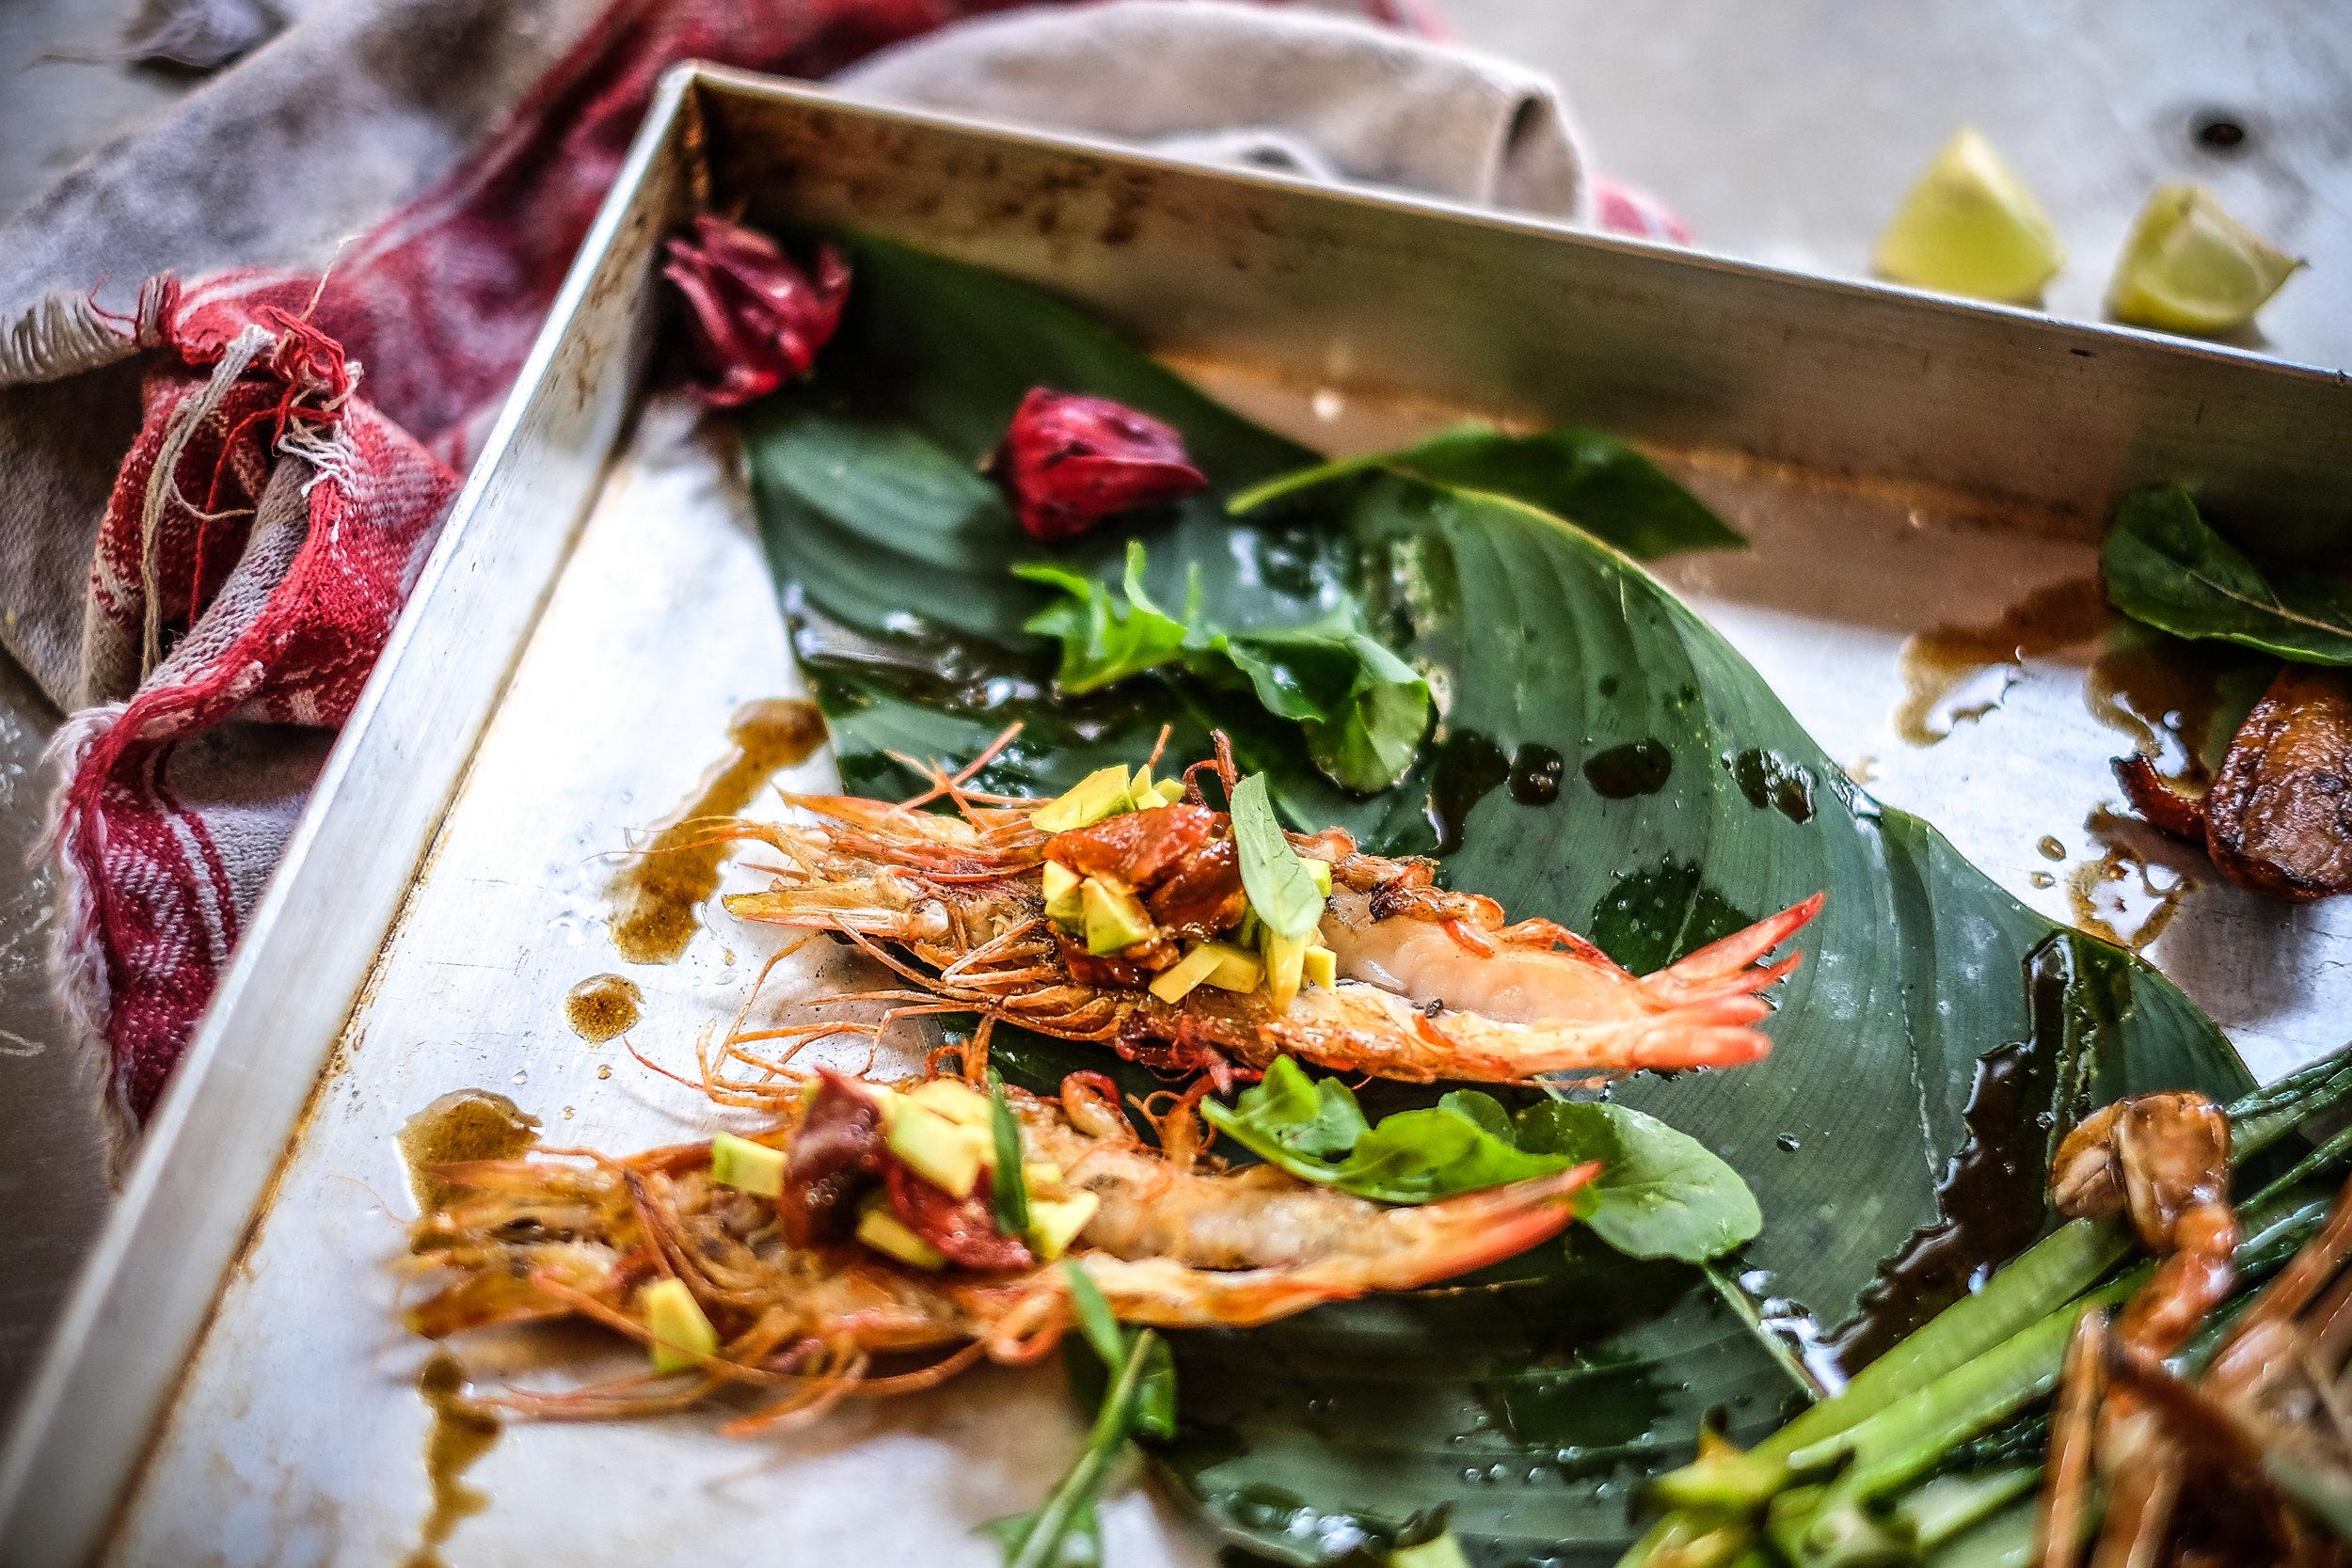 Matsya Freestyle Kitchen Restaurant / Appetizer